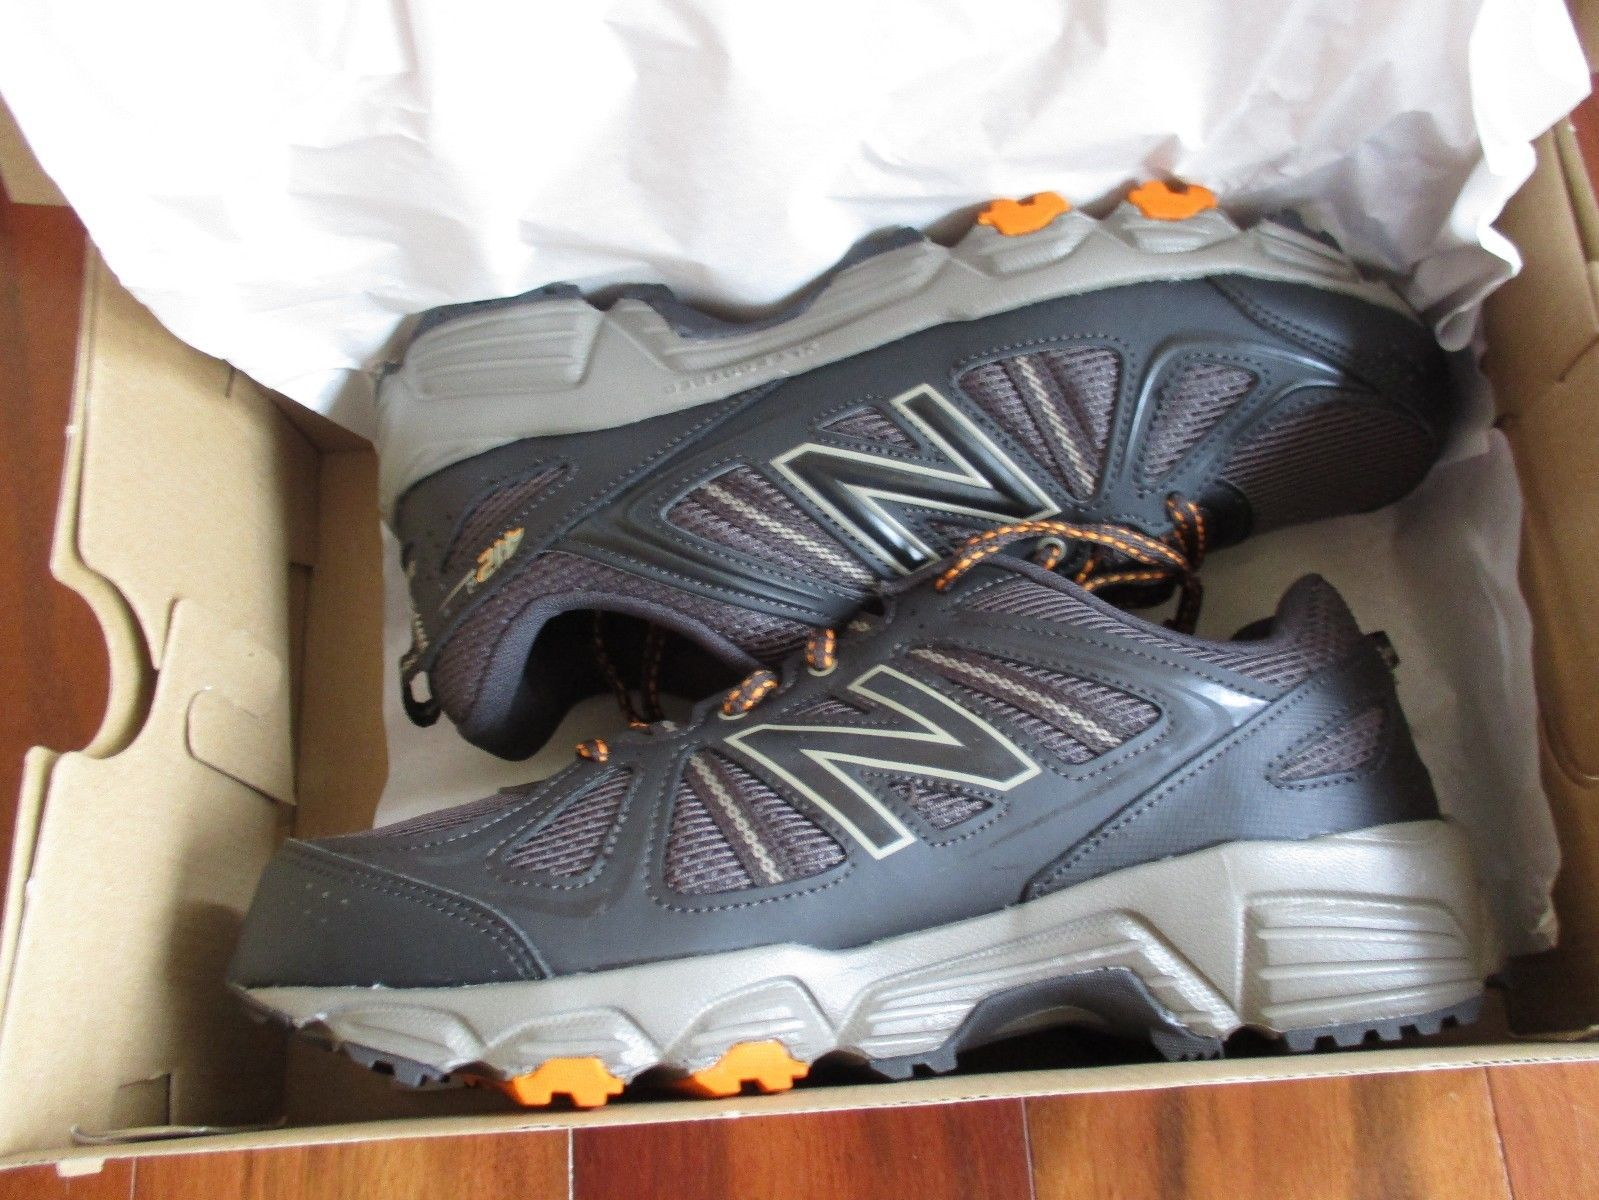 49ac9c4d BNIB New Balance MTE412G2 Men's Trail and 50 similar items